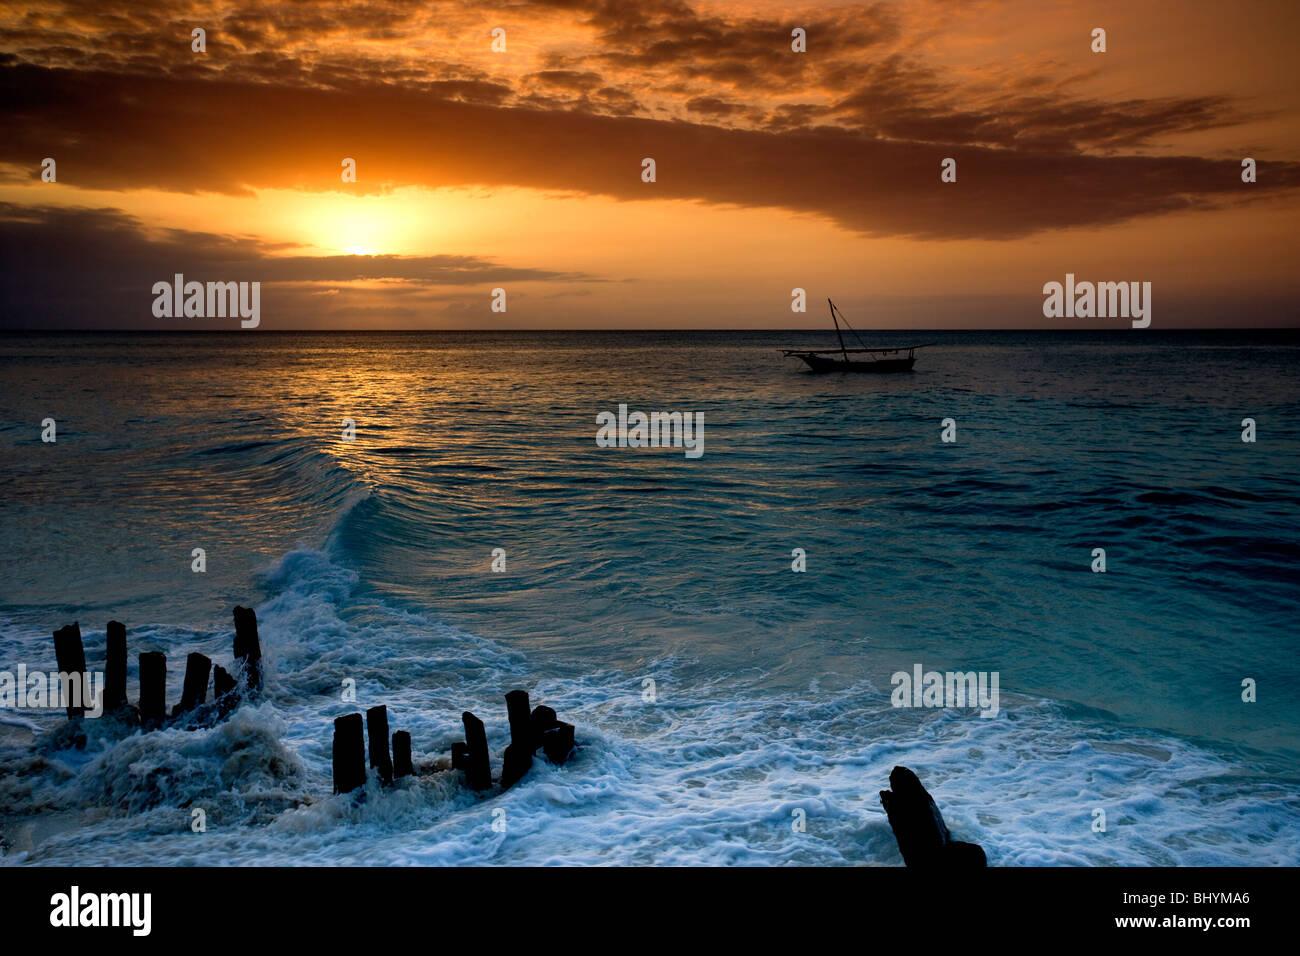 Sunset at Nungwi, North Zanzibar, Tanzania, East Africa - Stock Image